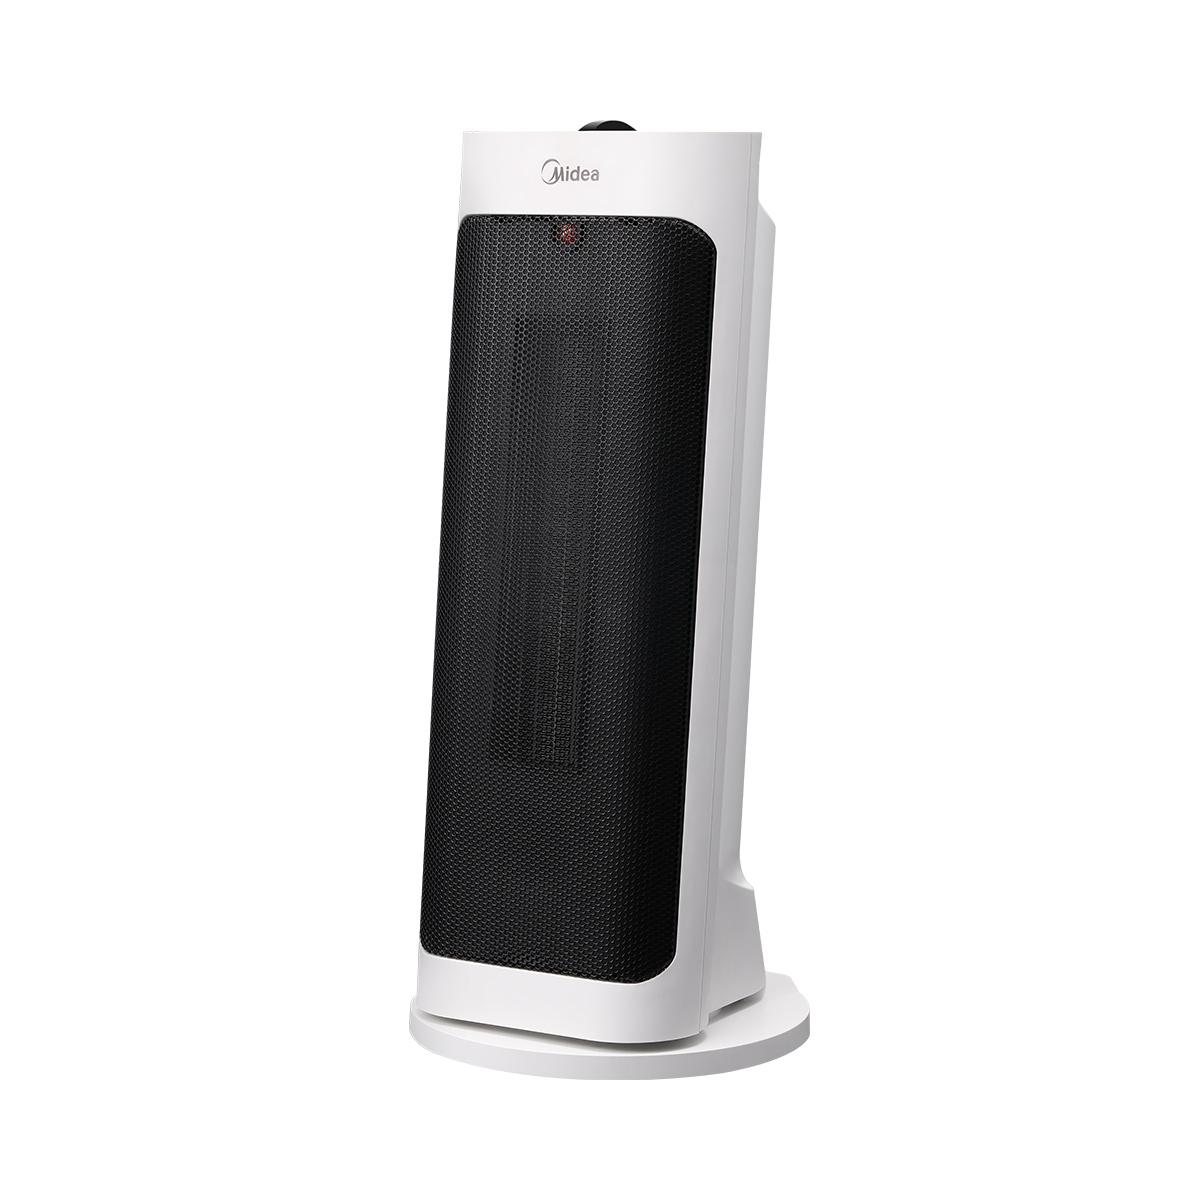 Midea/美的 HFY20J电暖器(油汀、暖风机) 说明书.pdf